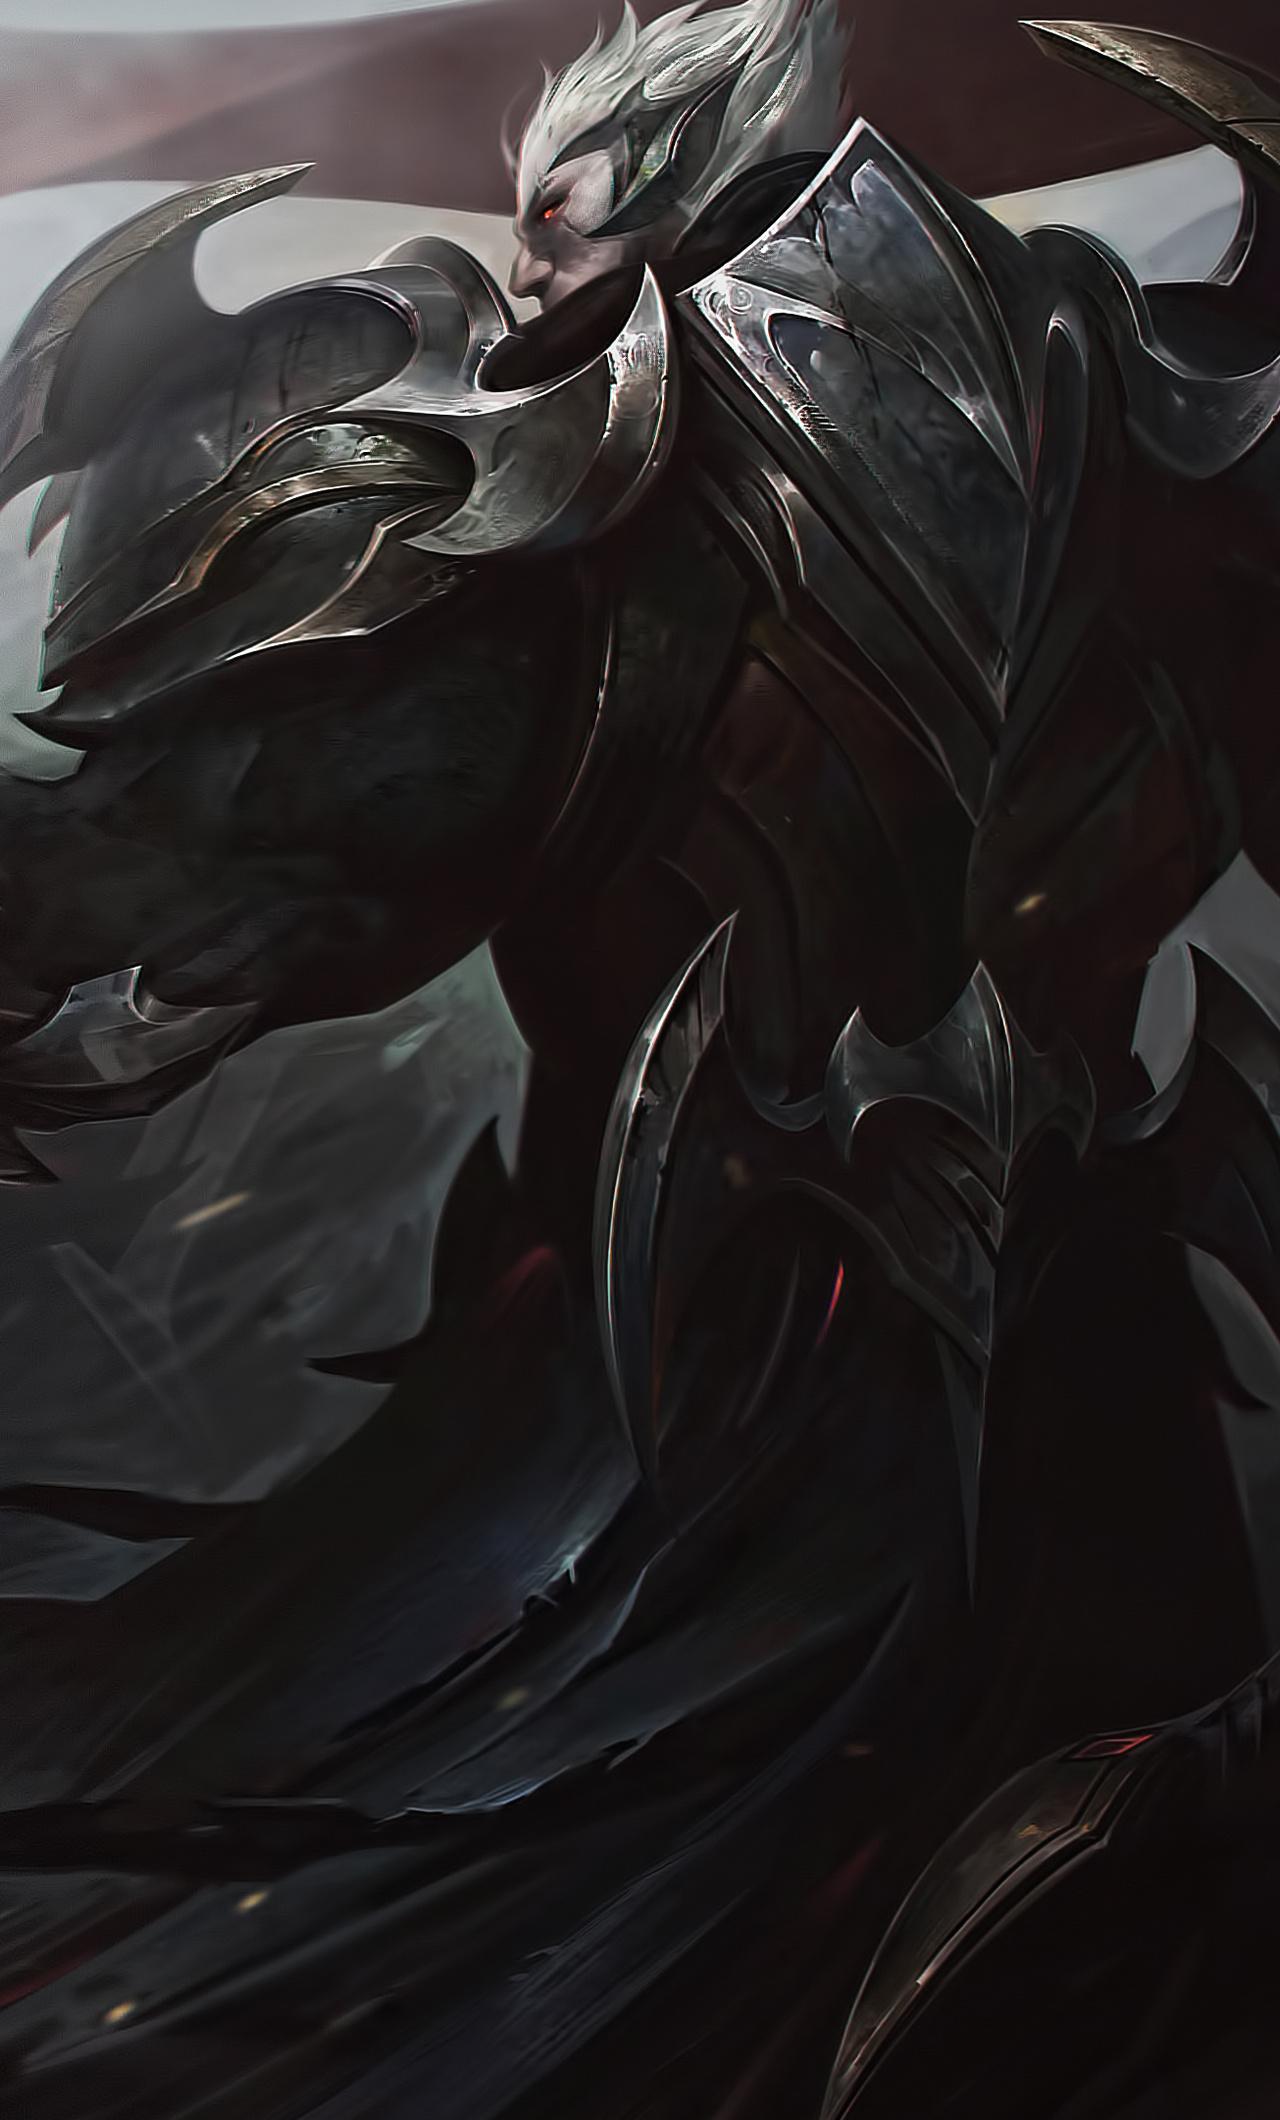 1280x2120 Darius League Of Legends 4k Iphone 6 Hd 4k Wallpapers